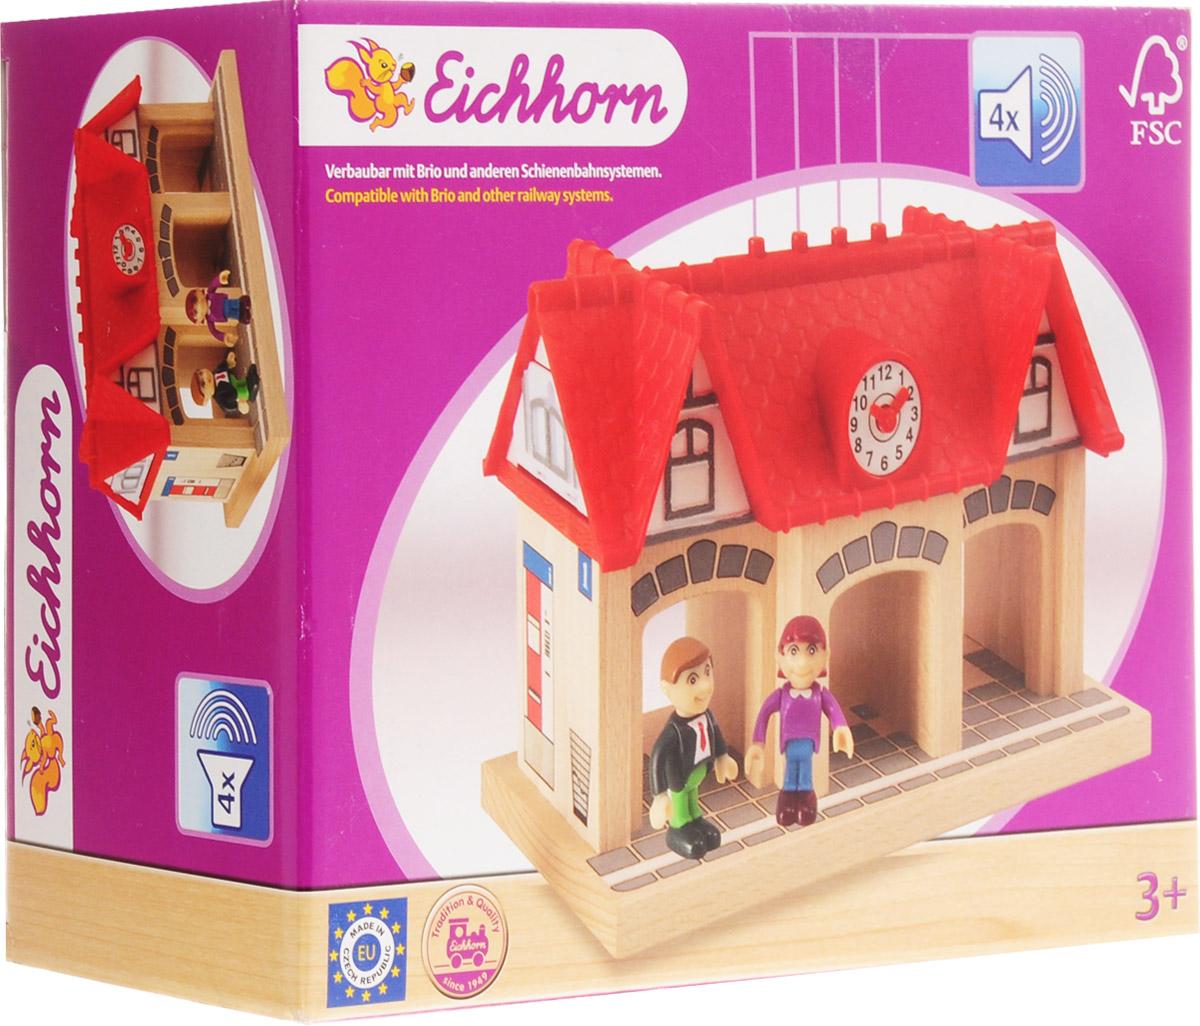 Eichhorn Остановка eichhorn eichhorn игра на запоминание тачки